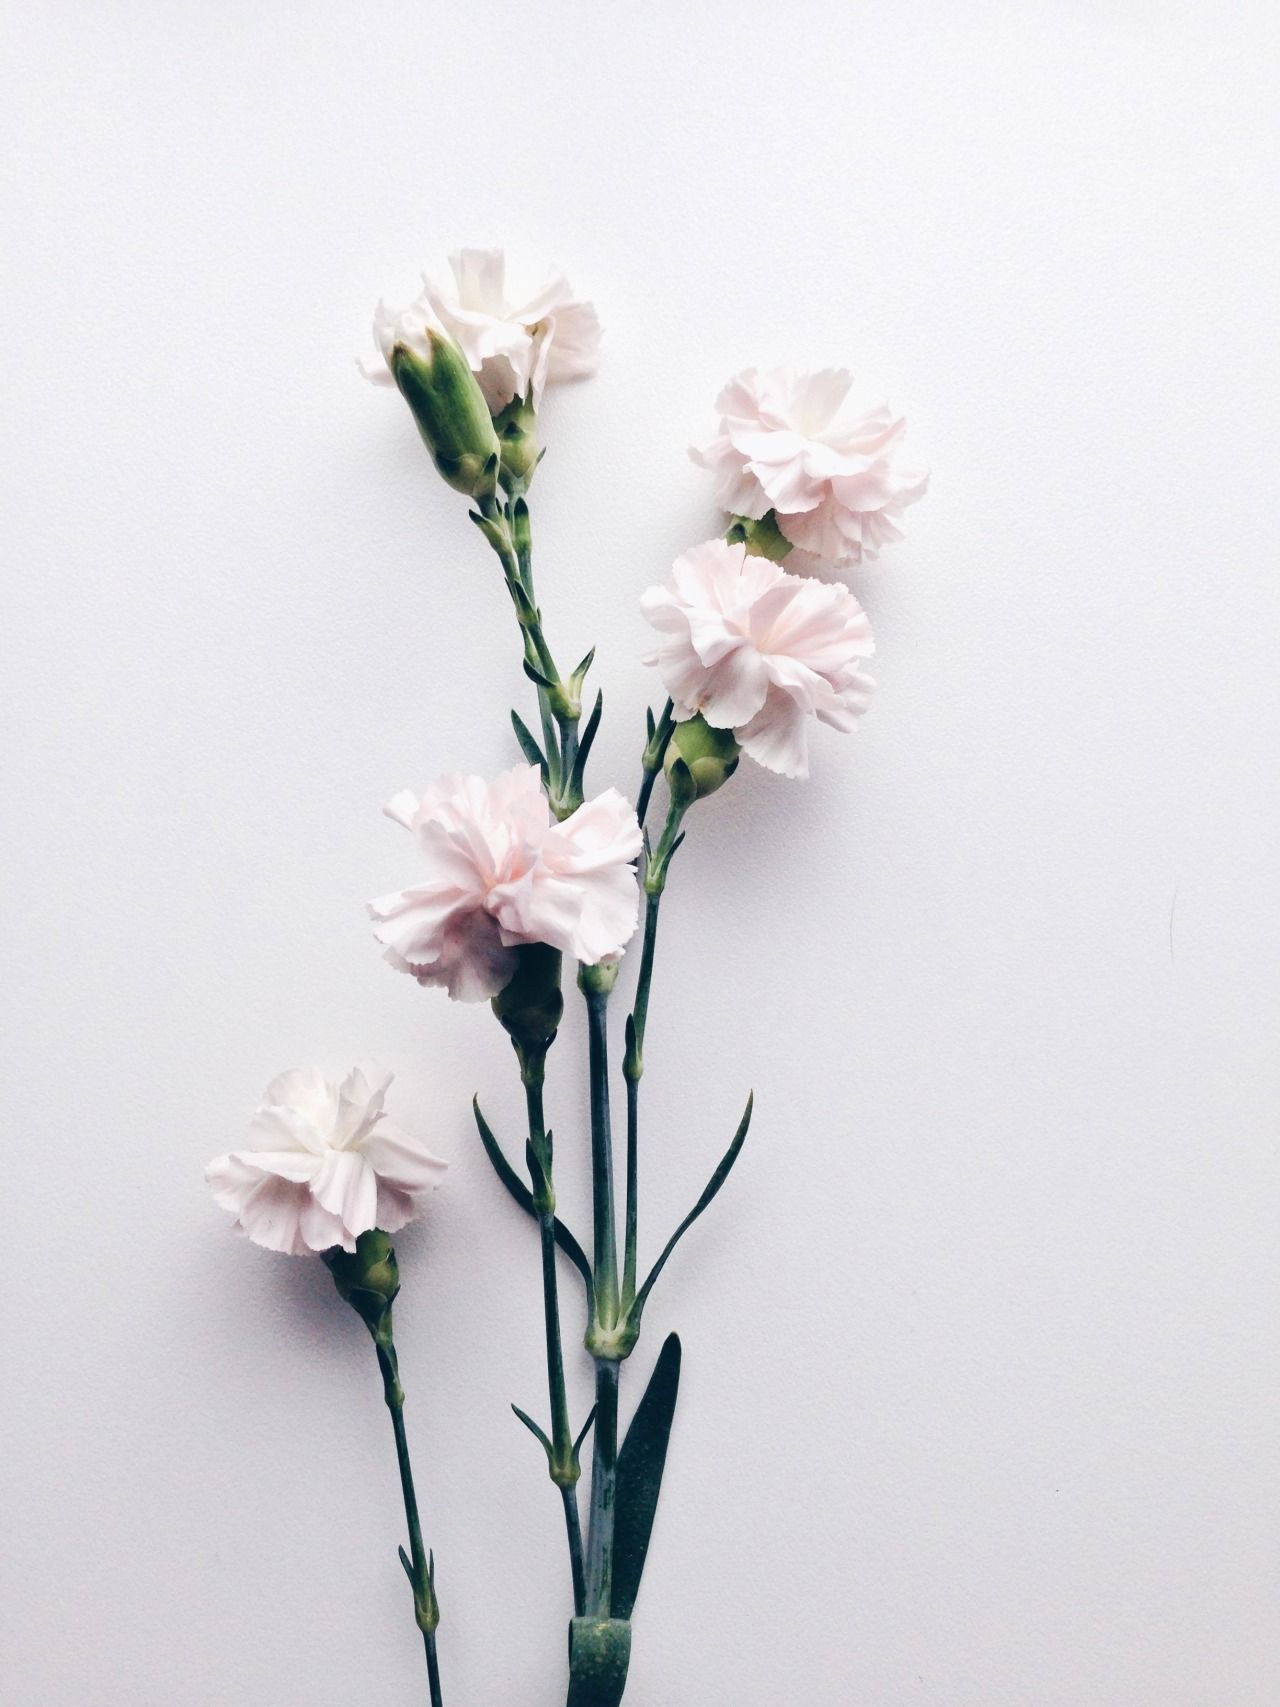 Trending Tumblr PATTERN Dianthus caryophyllus Month flowers 1280x1707